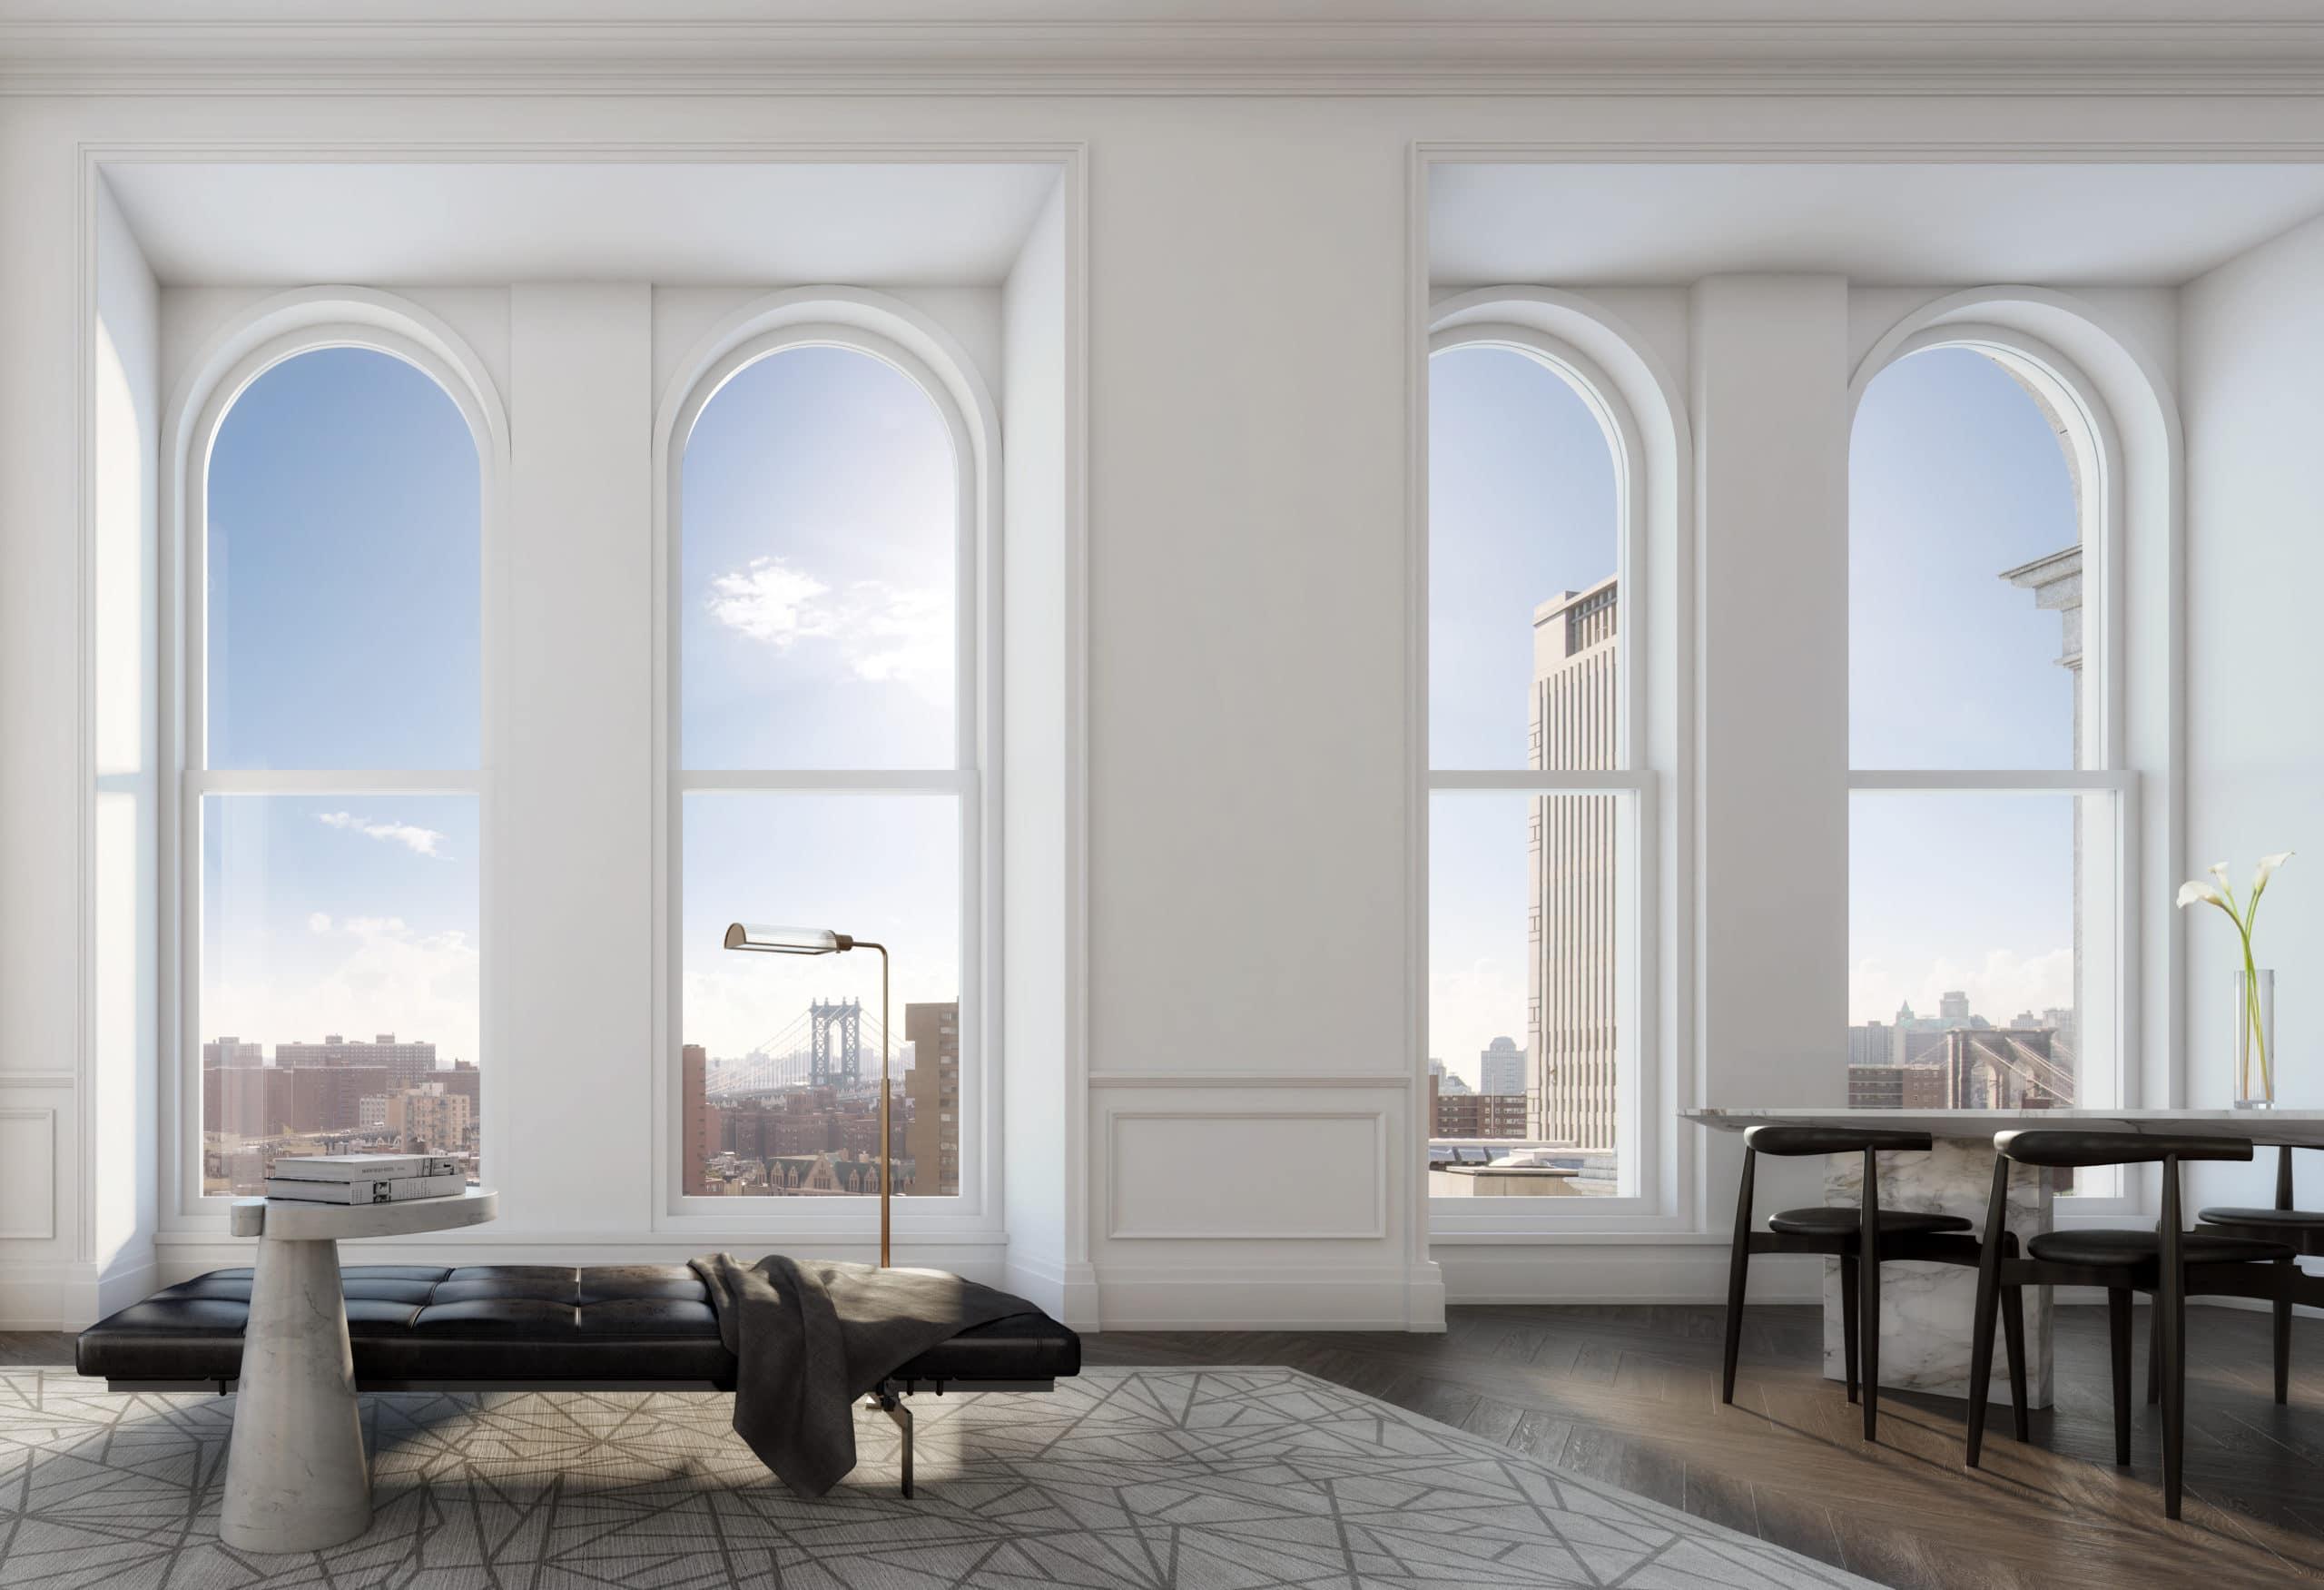 Interior residence condominium at 108 Leonard with white walls, wood flooring, and windows that overlook New York City.